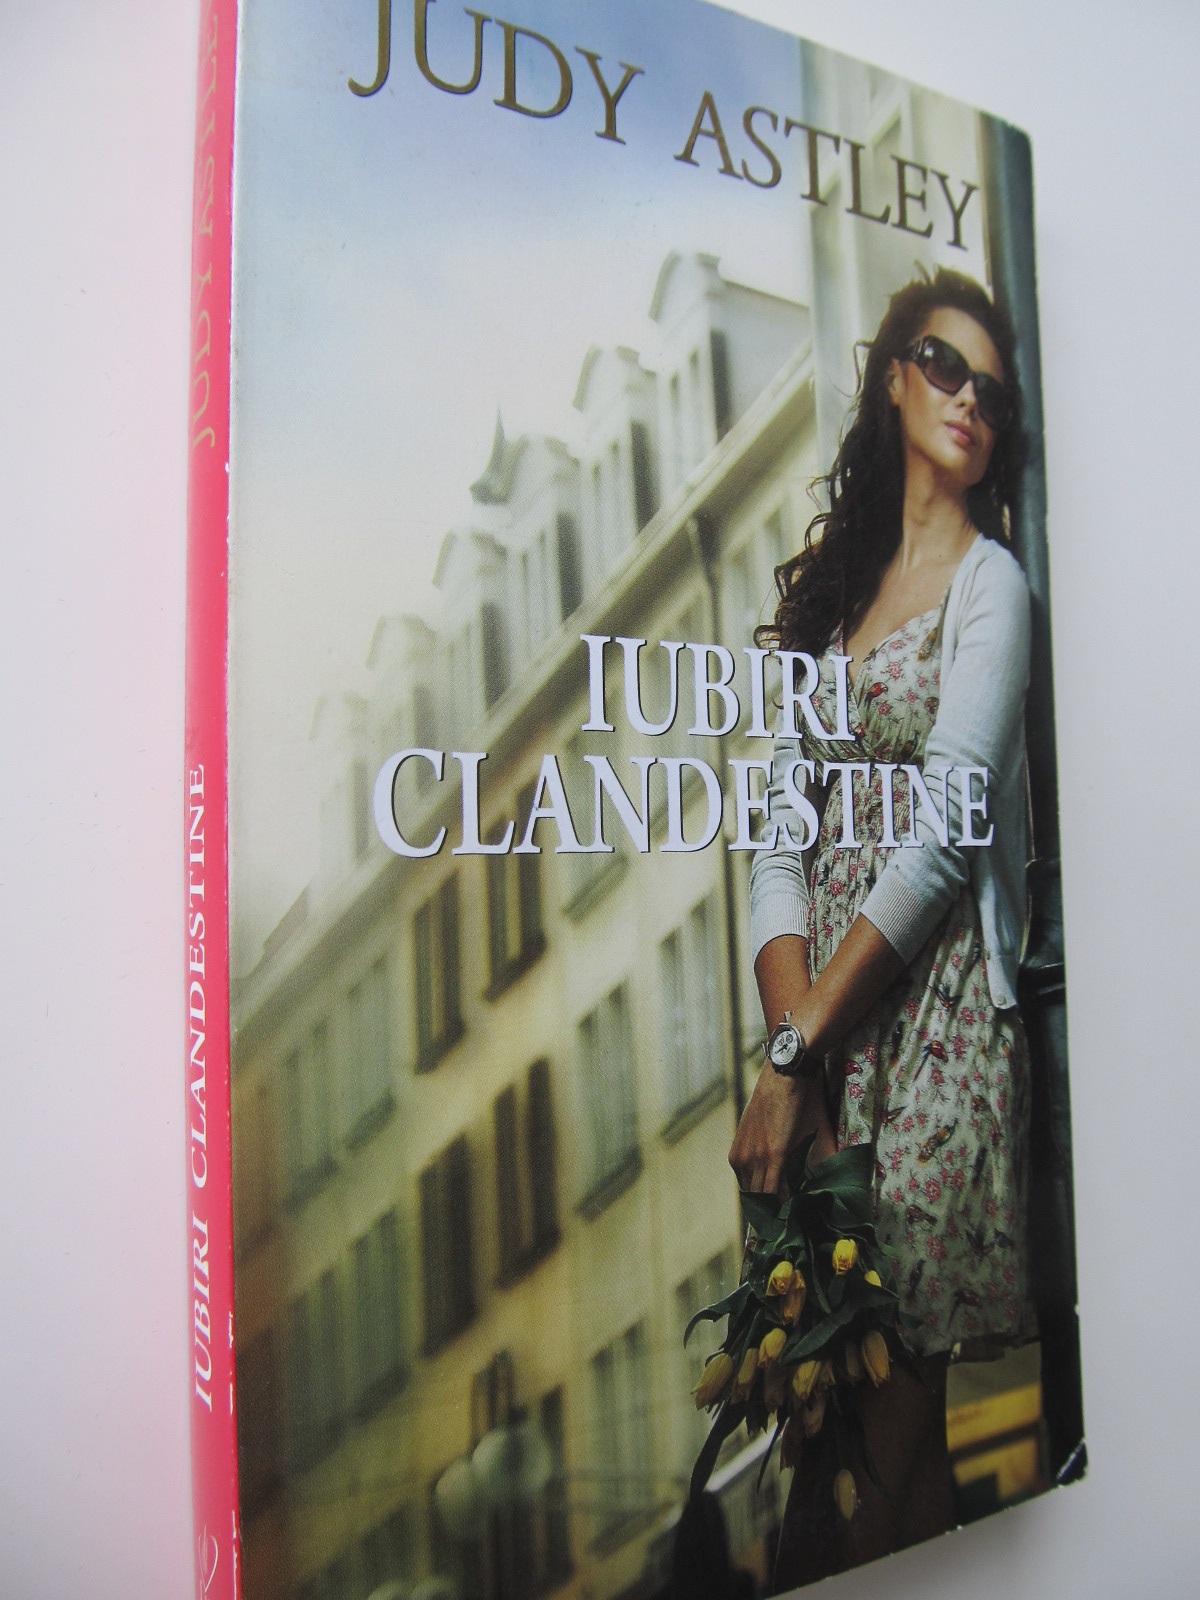 Iubiri clandestine - Judy Astley | Detalii carte